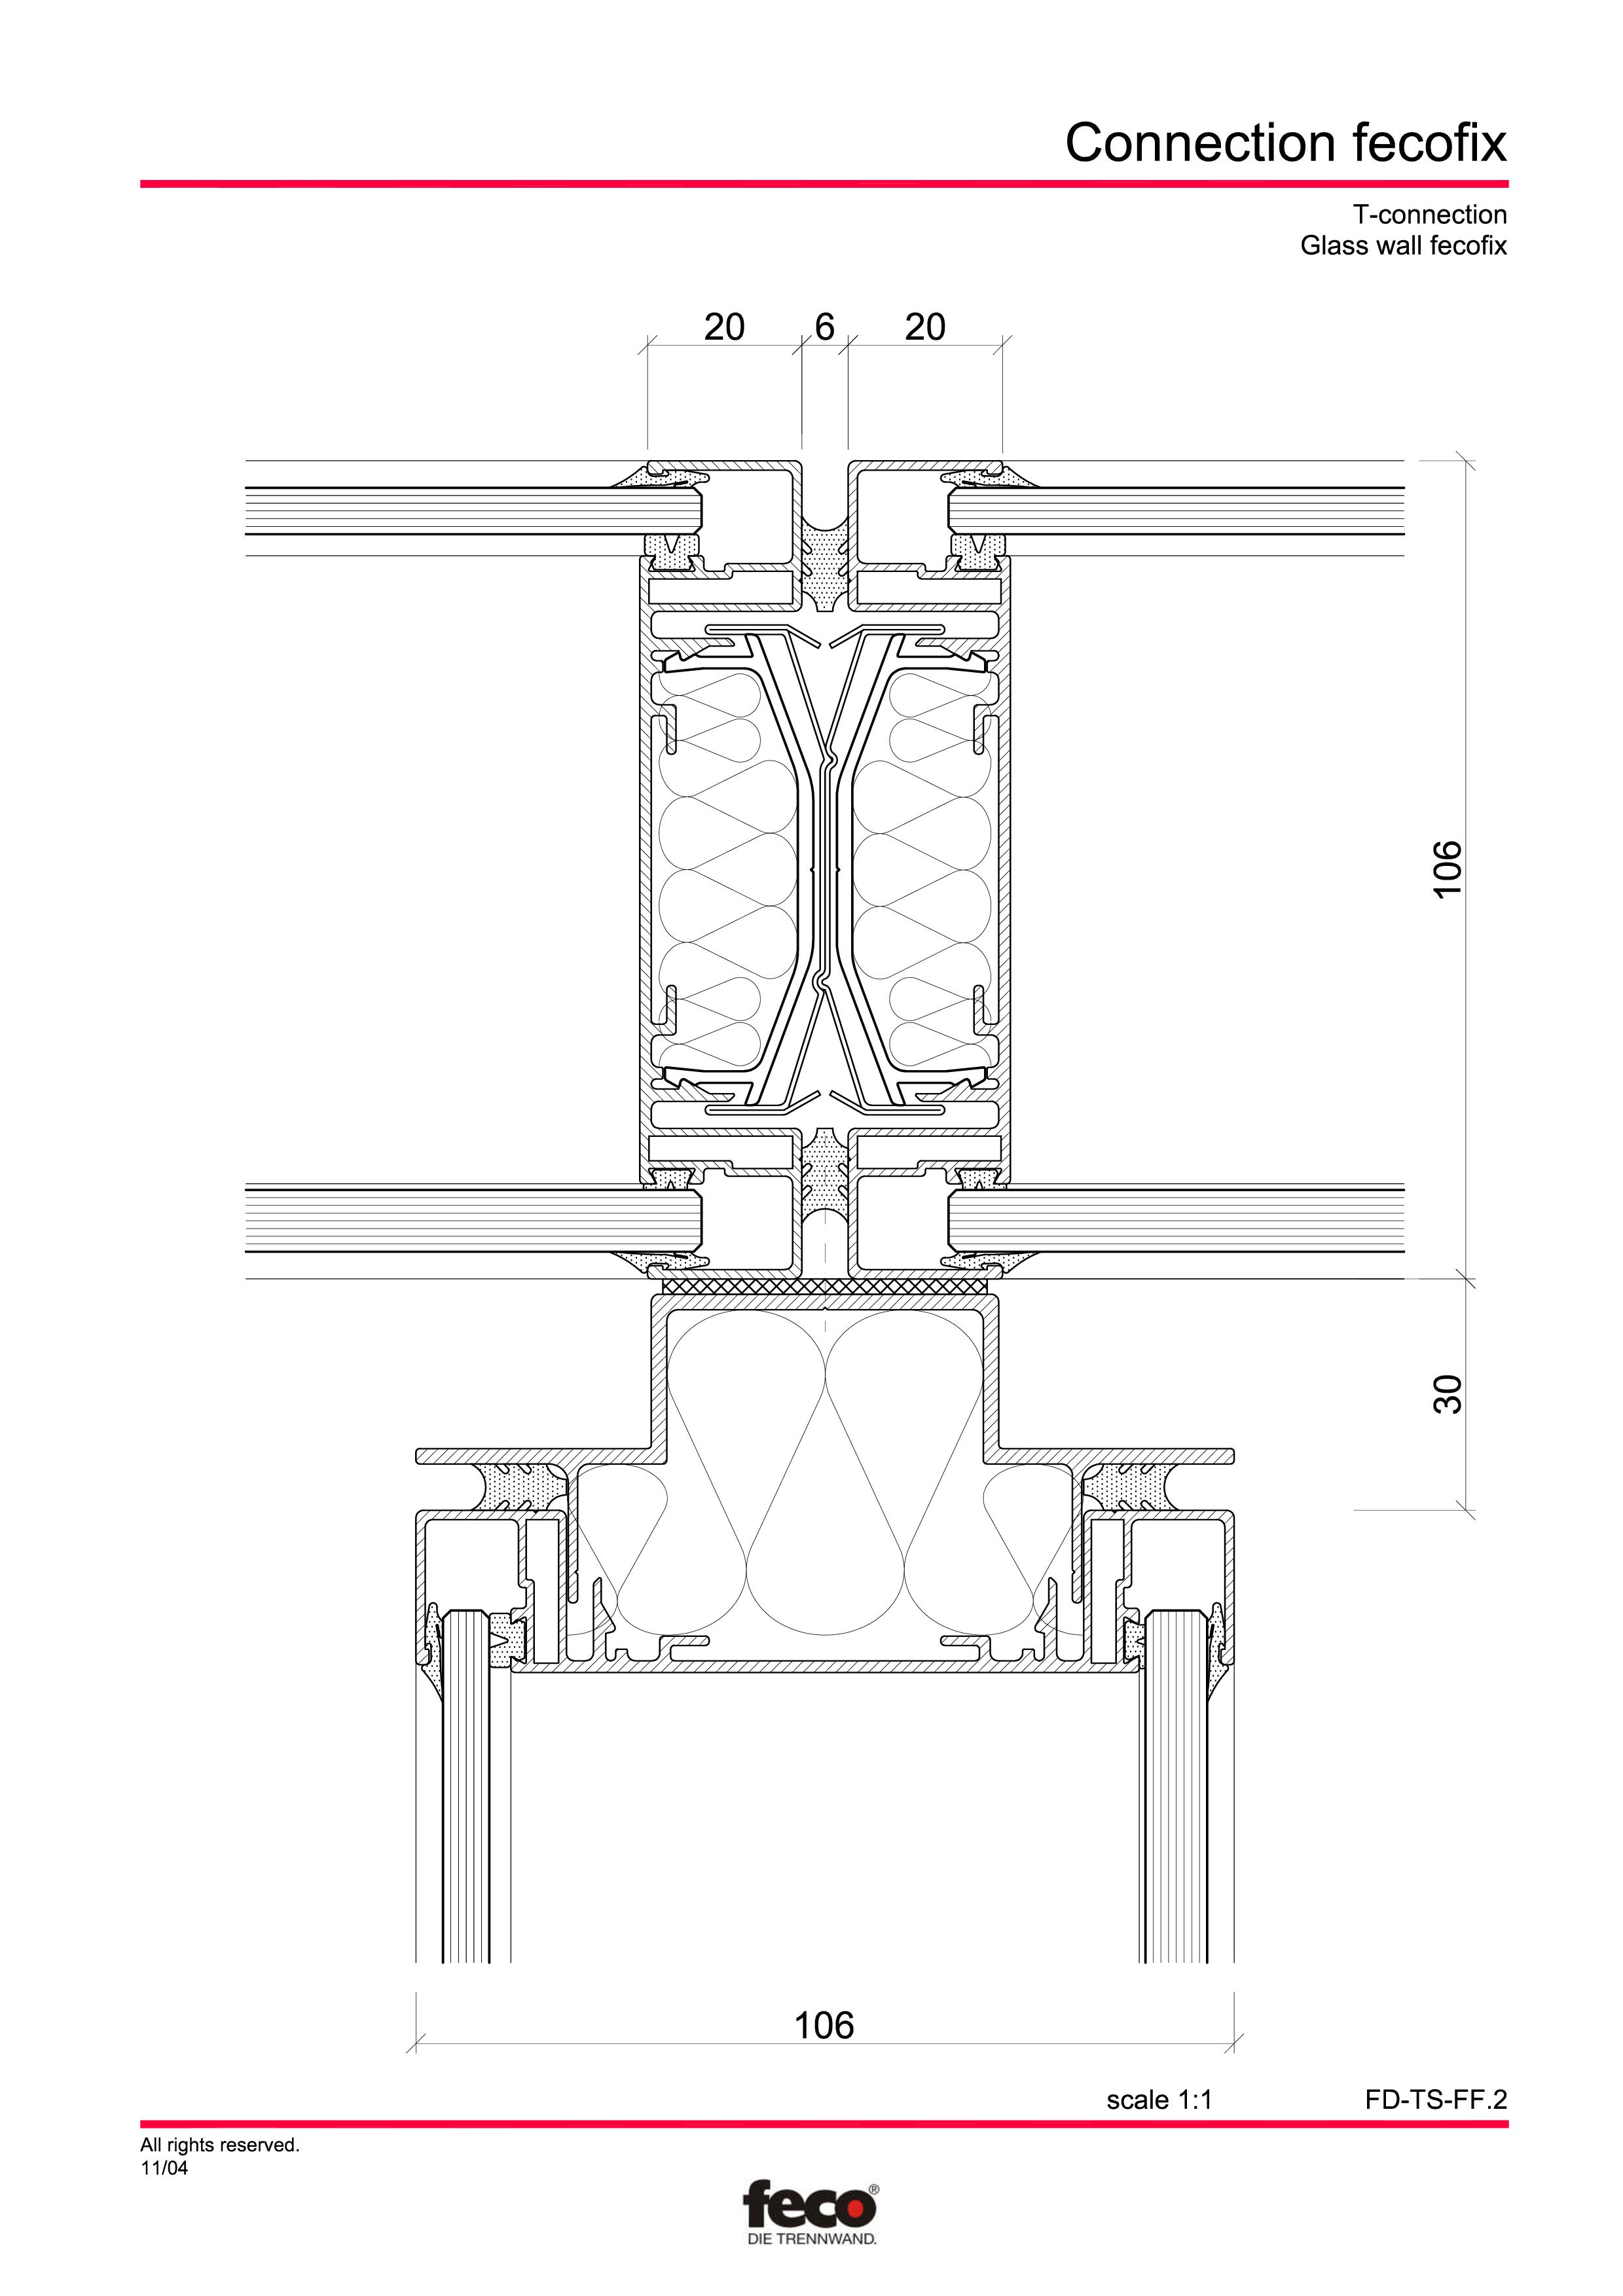 Pagina 7 - CAD-PDF Detaliu racord pereti FECO Detaliu de montaj FecoPur, FecoFix, FecoLux